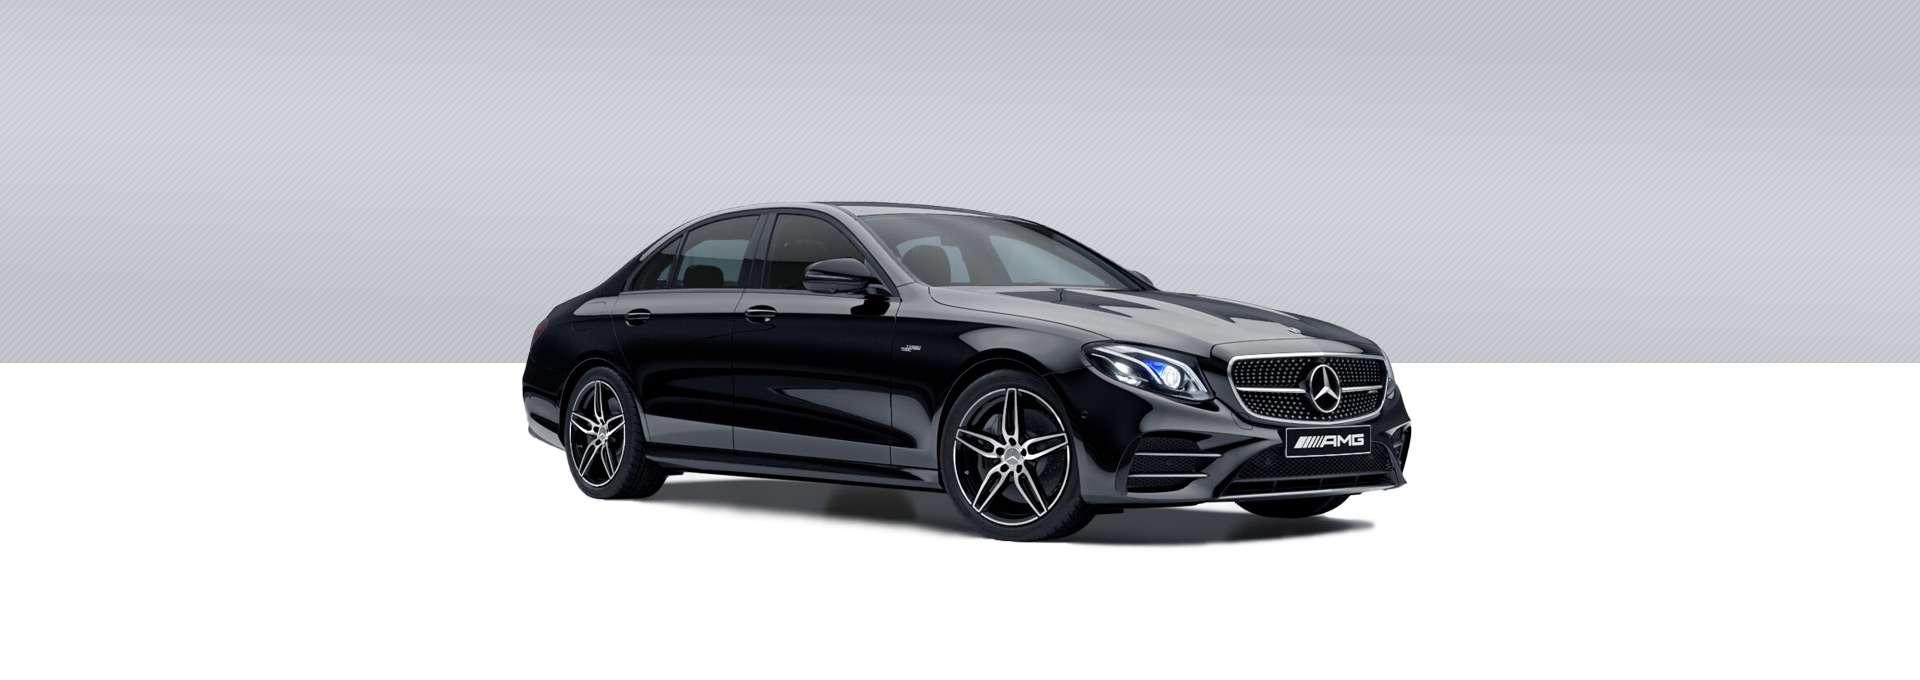 Mercedes Benz AMG CLASE E BERLINA